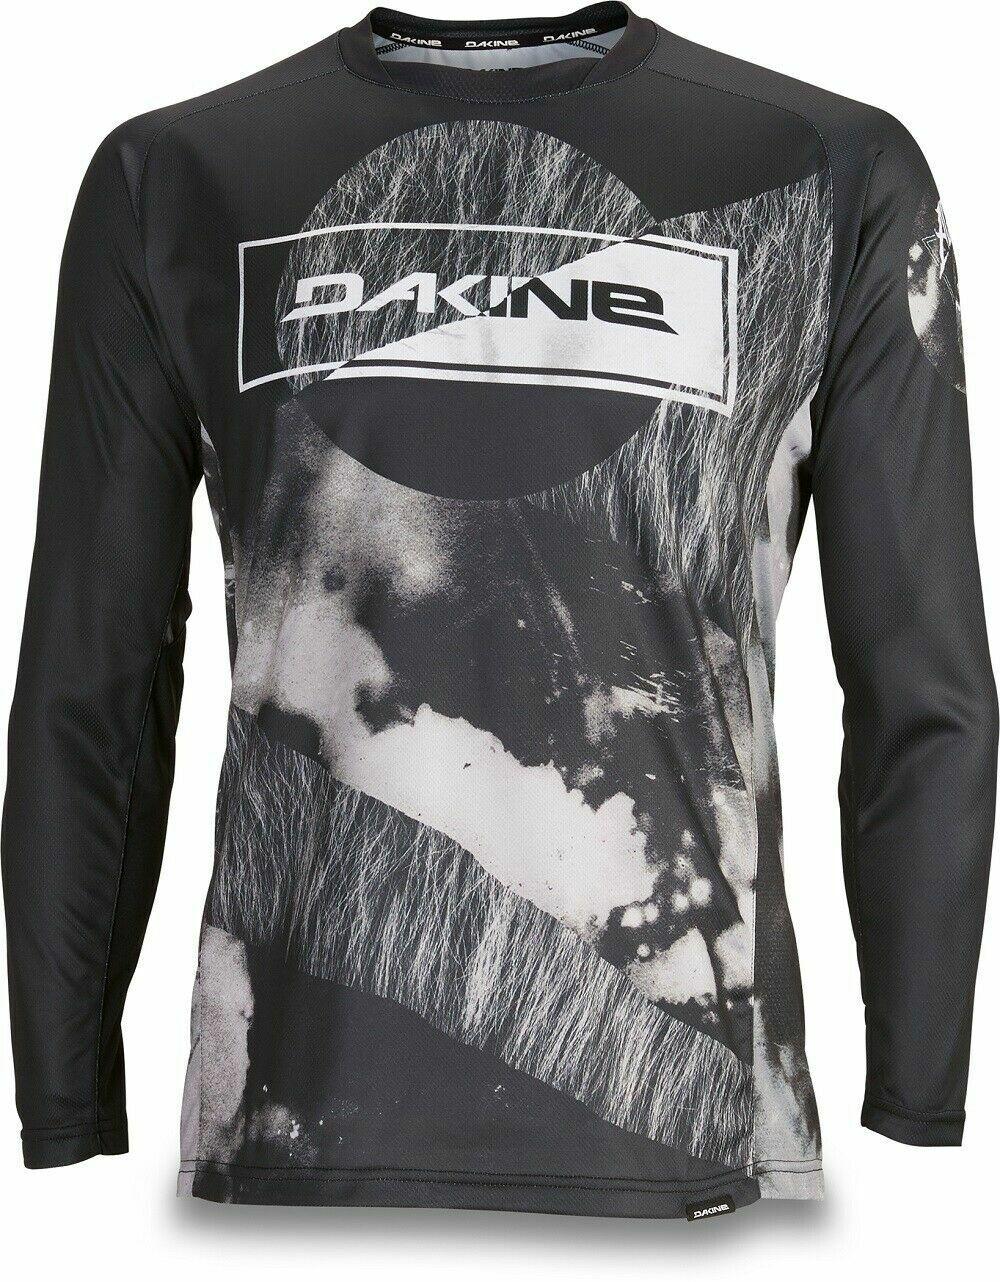 Dakine Aggy Blk Thrillium Long Sleeve Bike Jersey Downhill Mountain Biking MTB